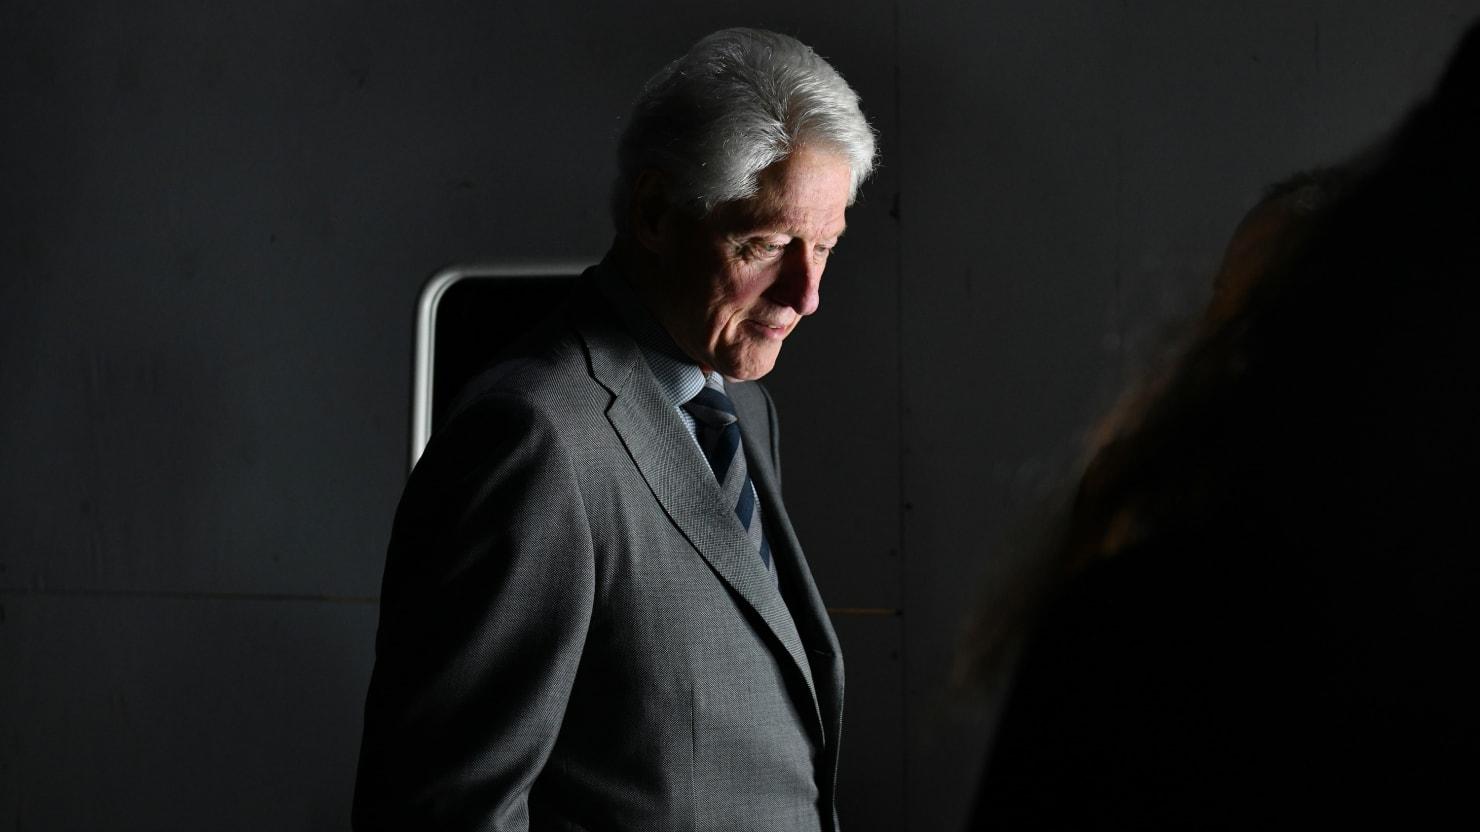 Netflix Exposes Bill Clinton's Creepy Jeffrey Epstein Ties